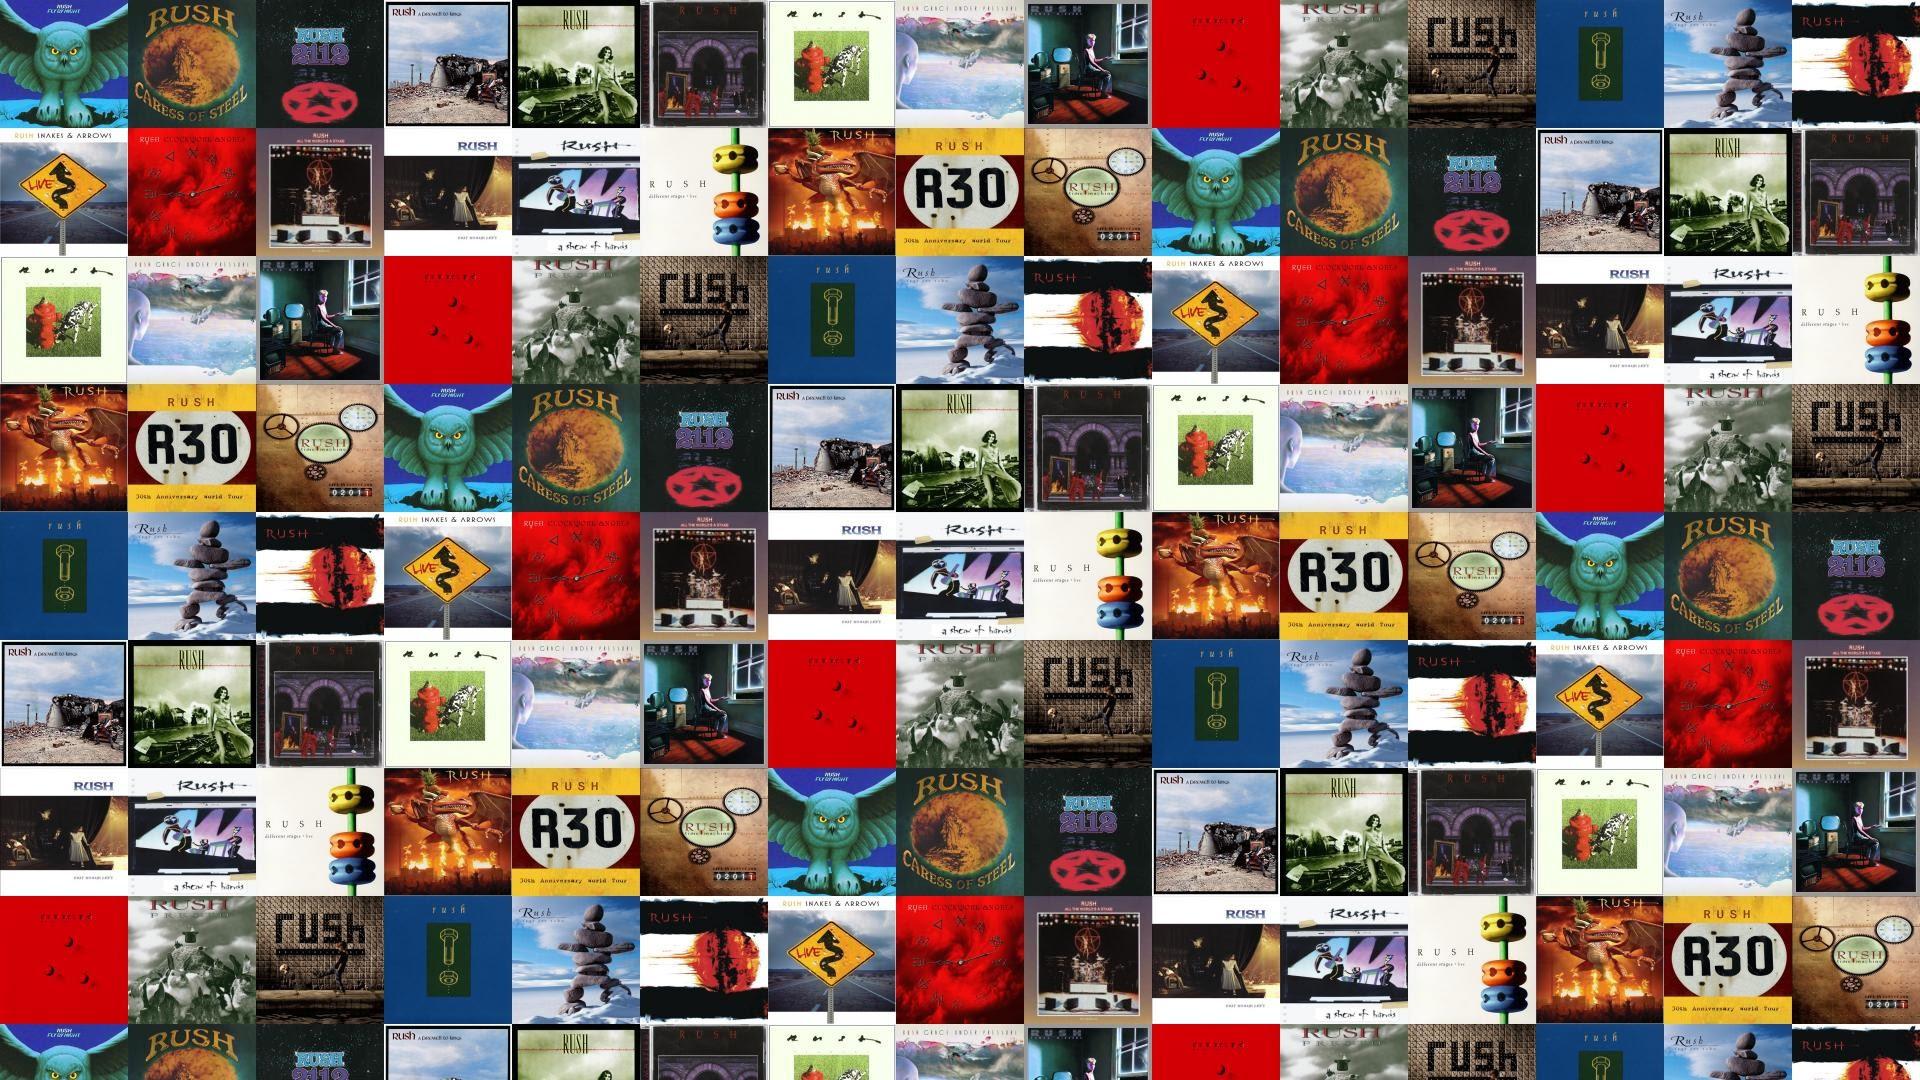 Rush Album Covers Wallpaper 64 Images